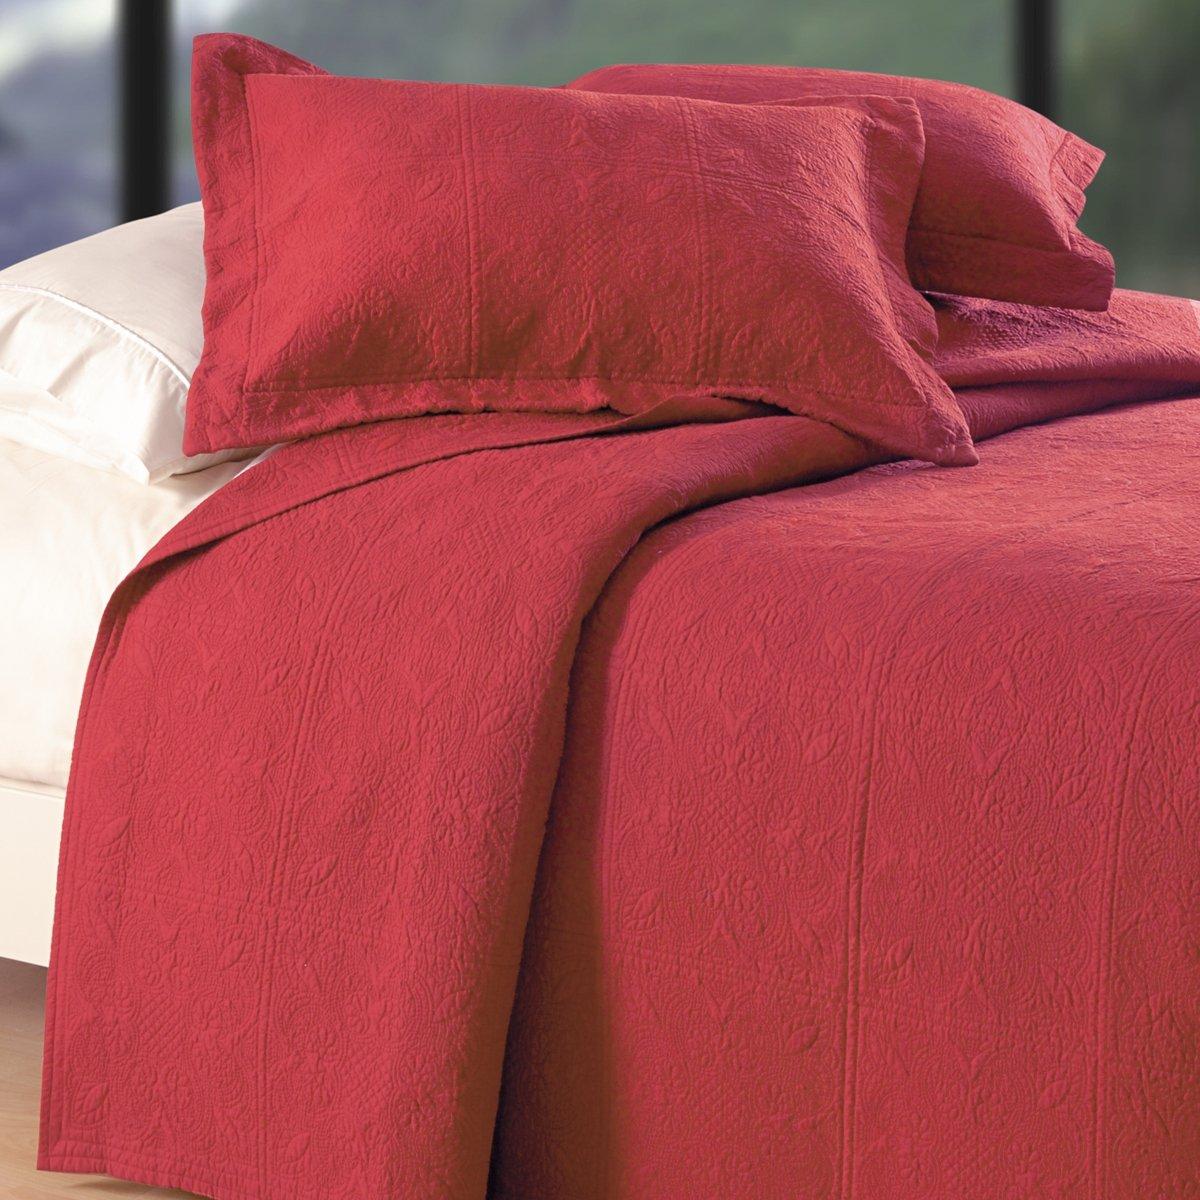 C&F Home Matelasse Cotton Quilt, Euro Sham 27x27, Brick Red